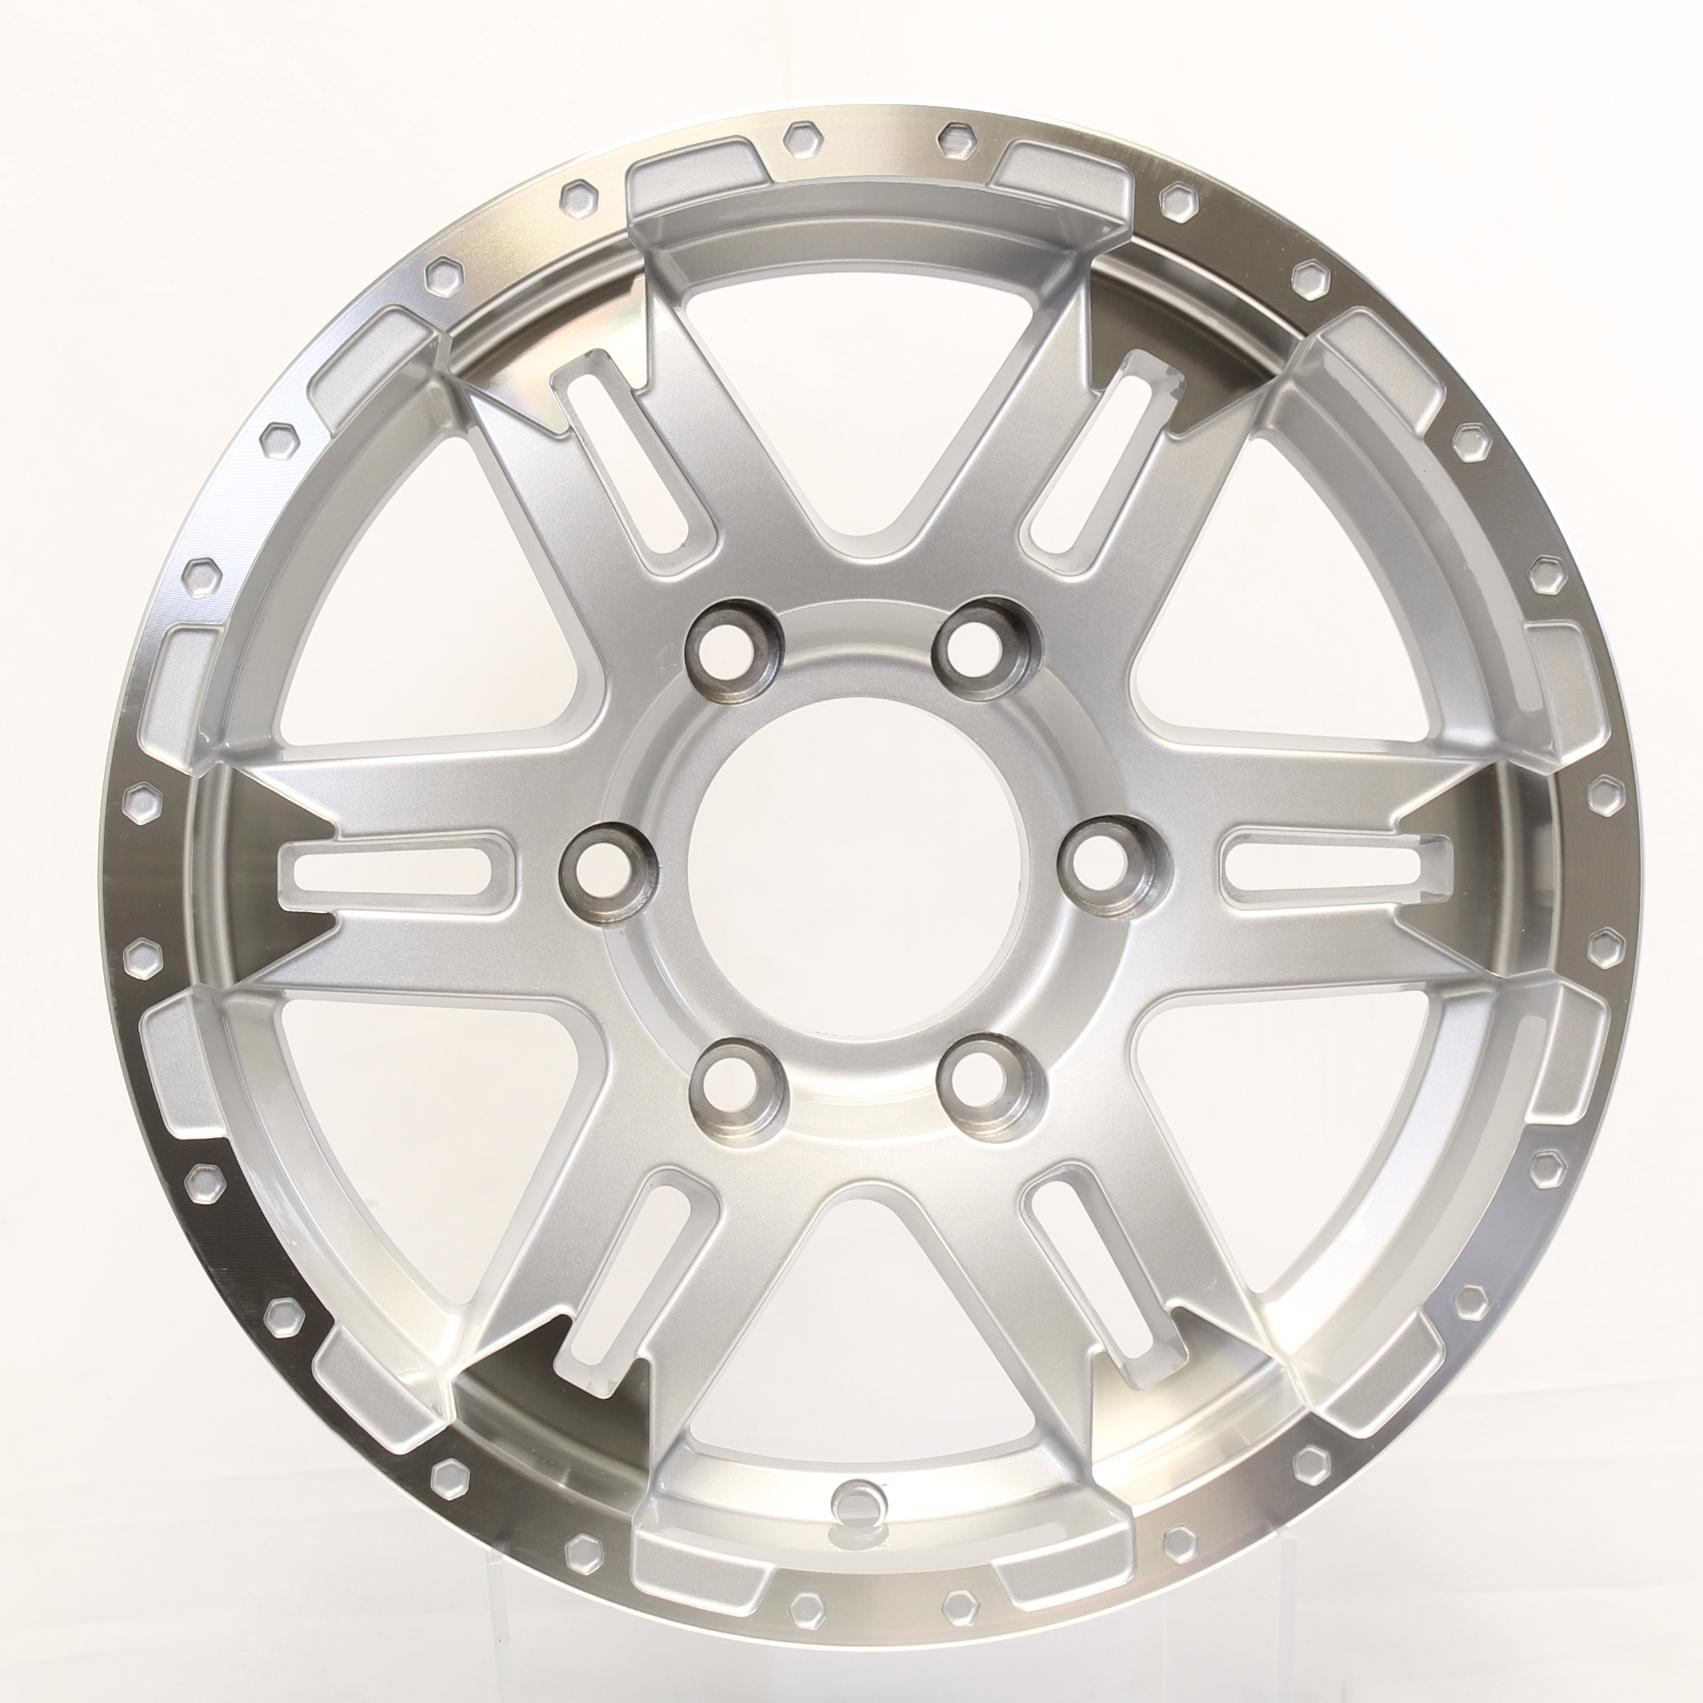 Turismo 15x6; 6-Lug Silver/Machine Aluminum Trailer Wheel Image